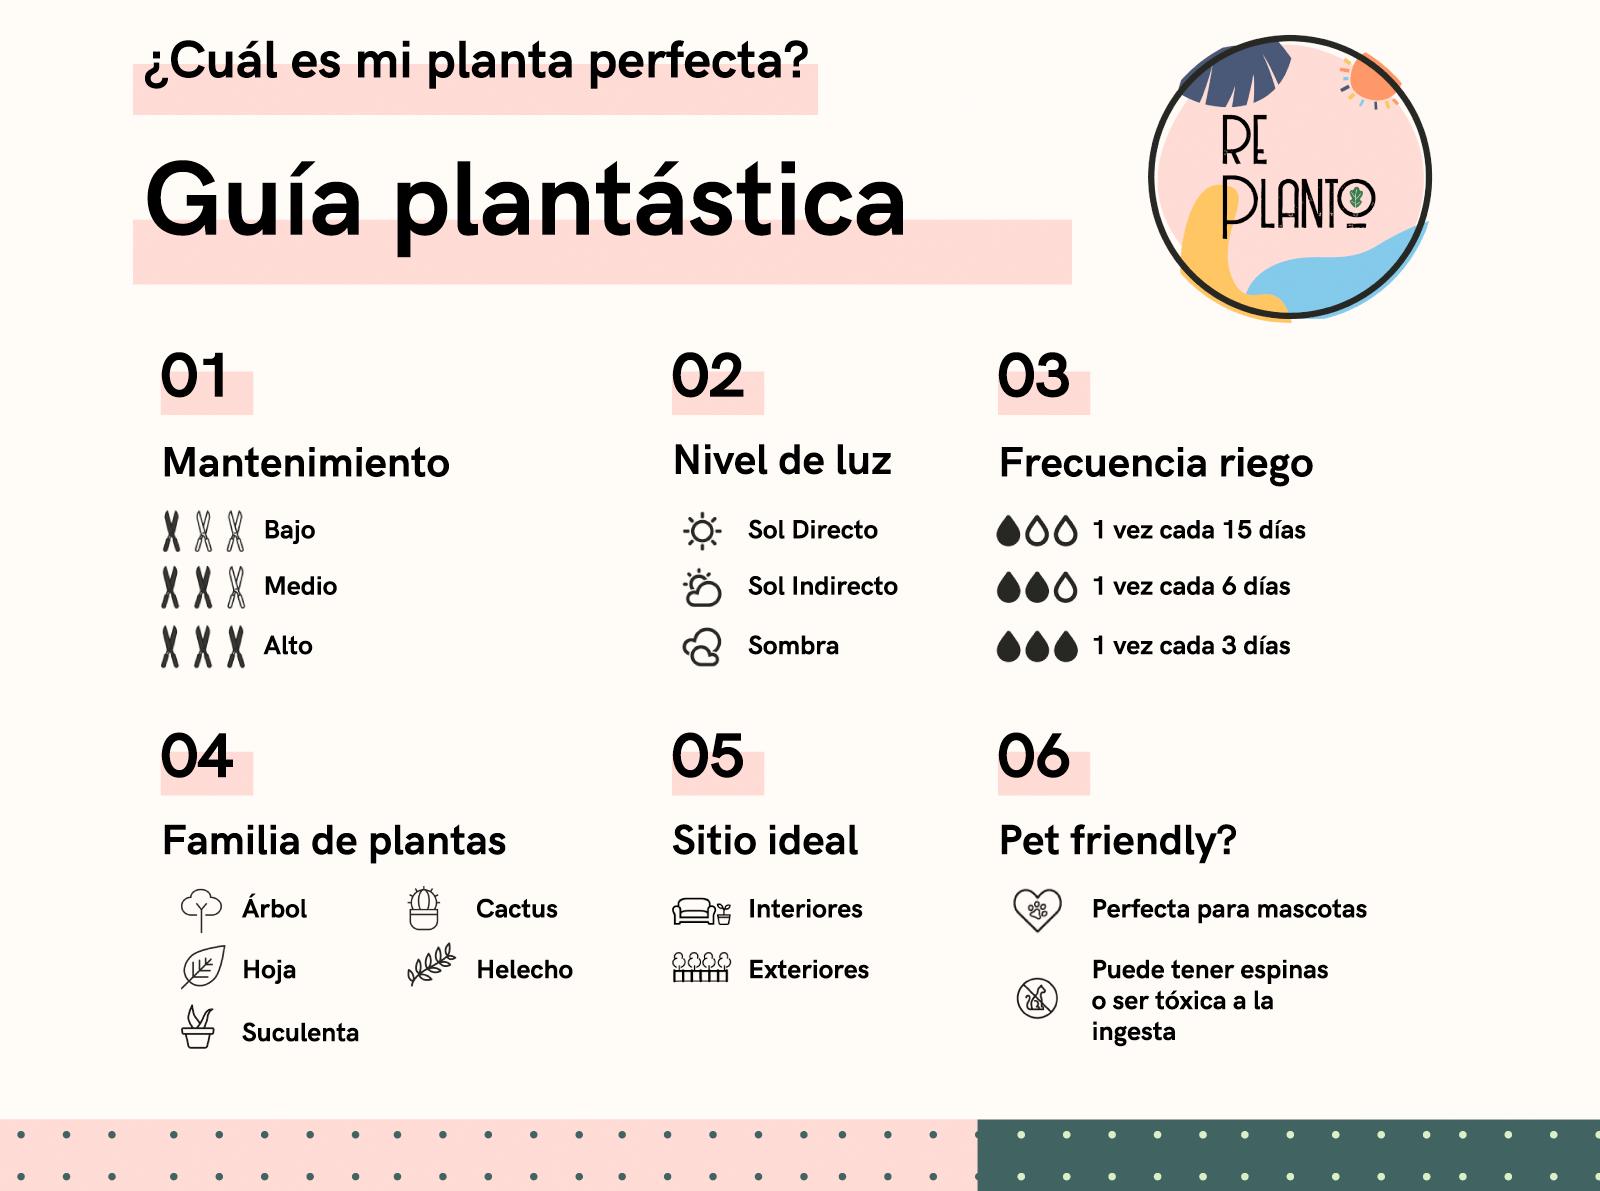 Guia Plantastica